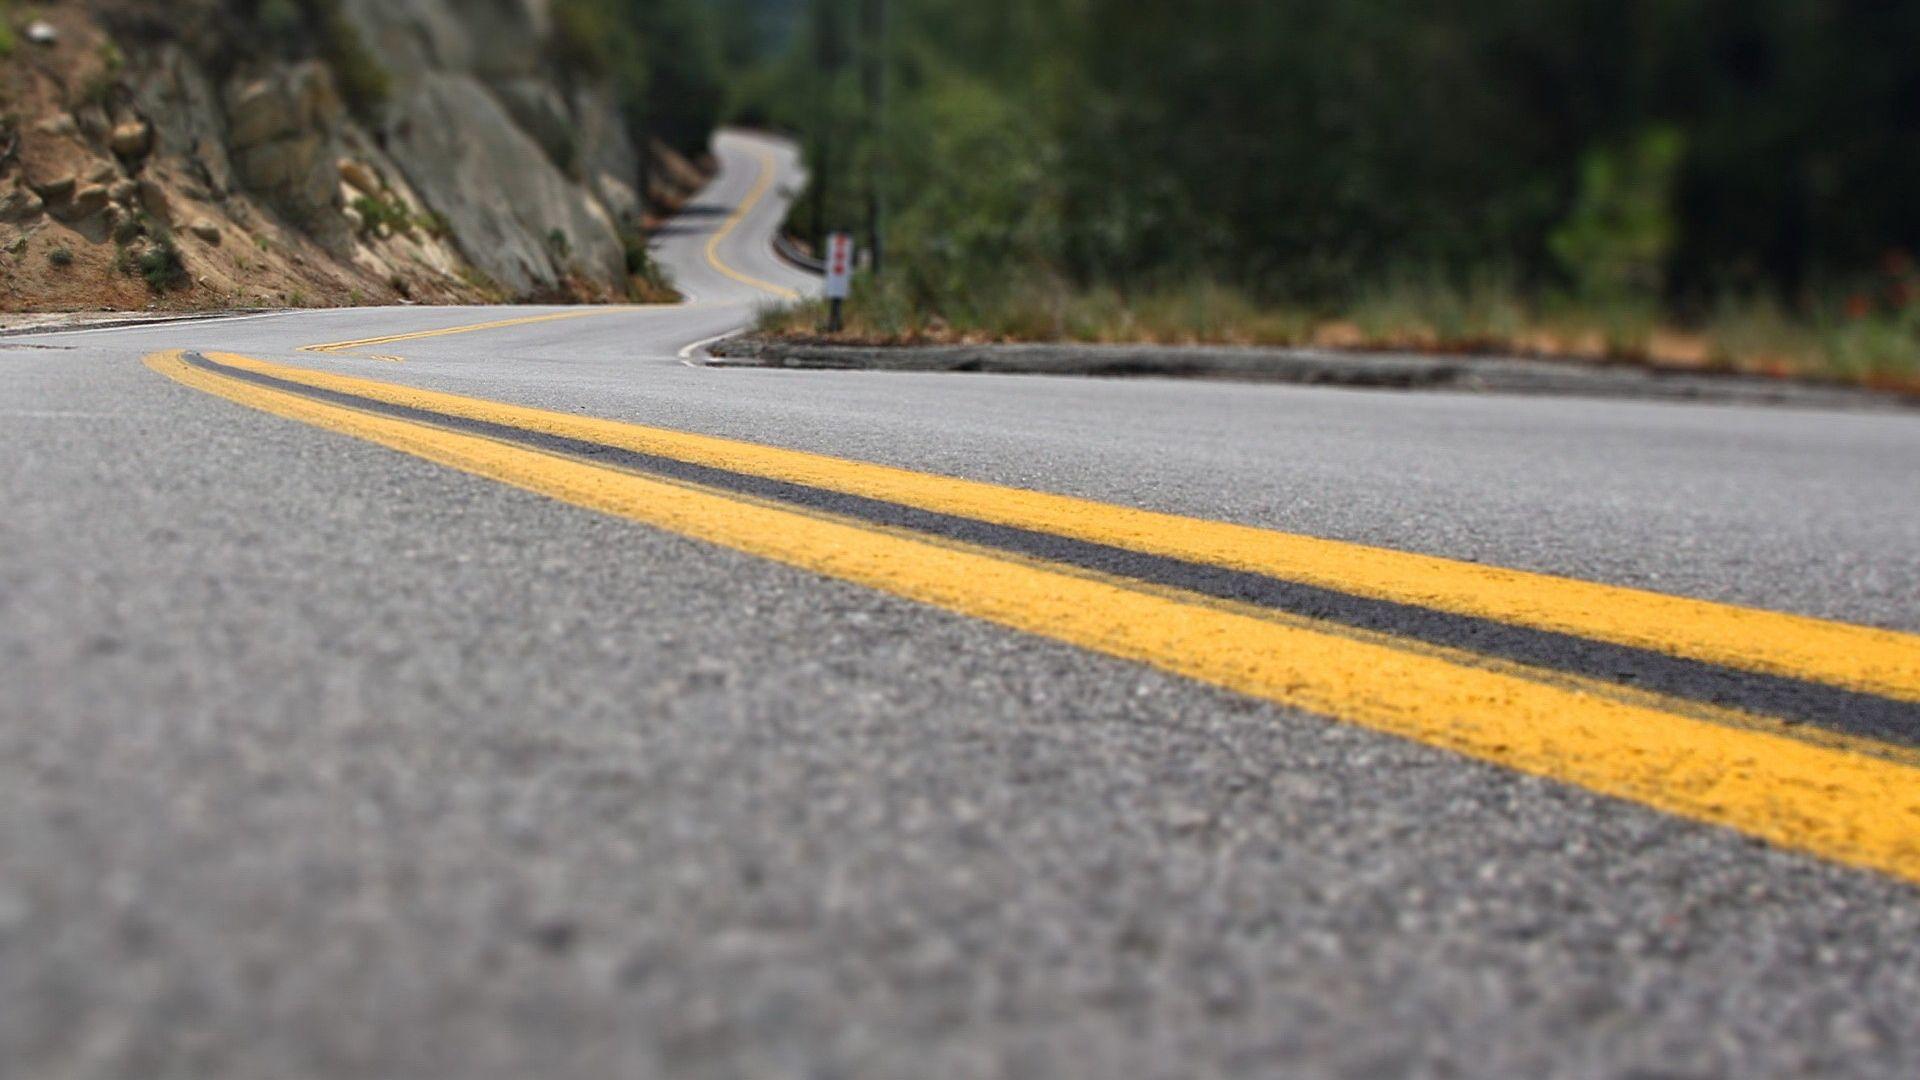 1920x1080 Wallpaper road, marking, lines, yellow, asphalt, turns